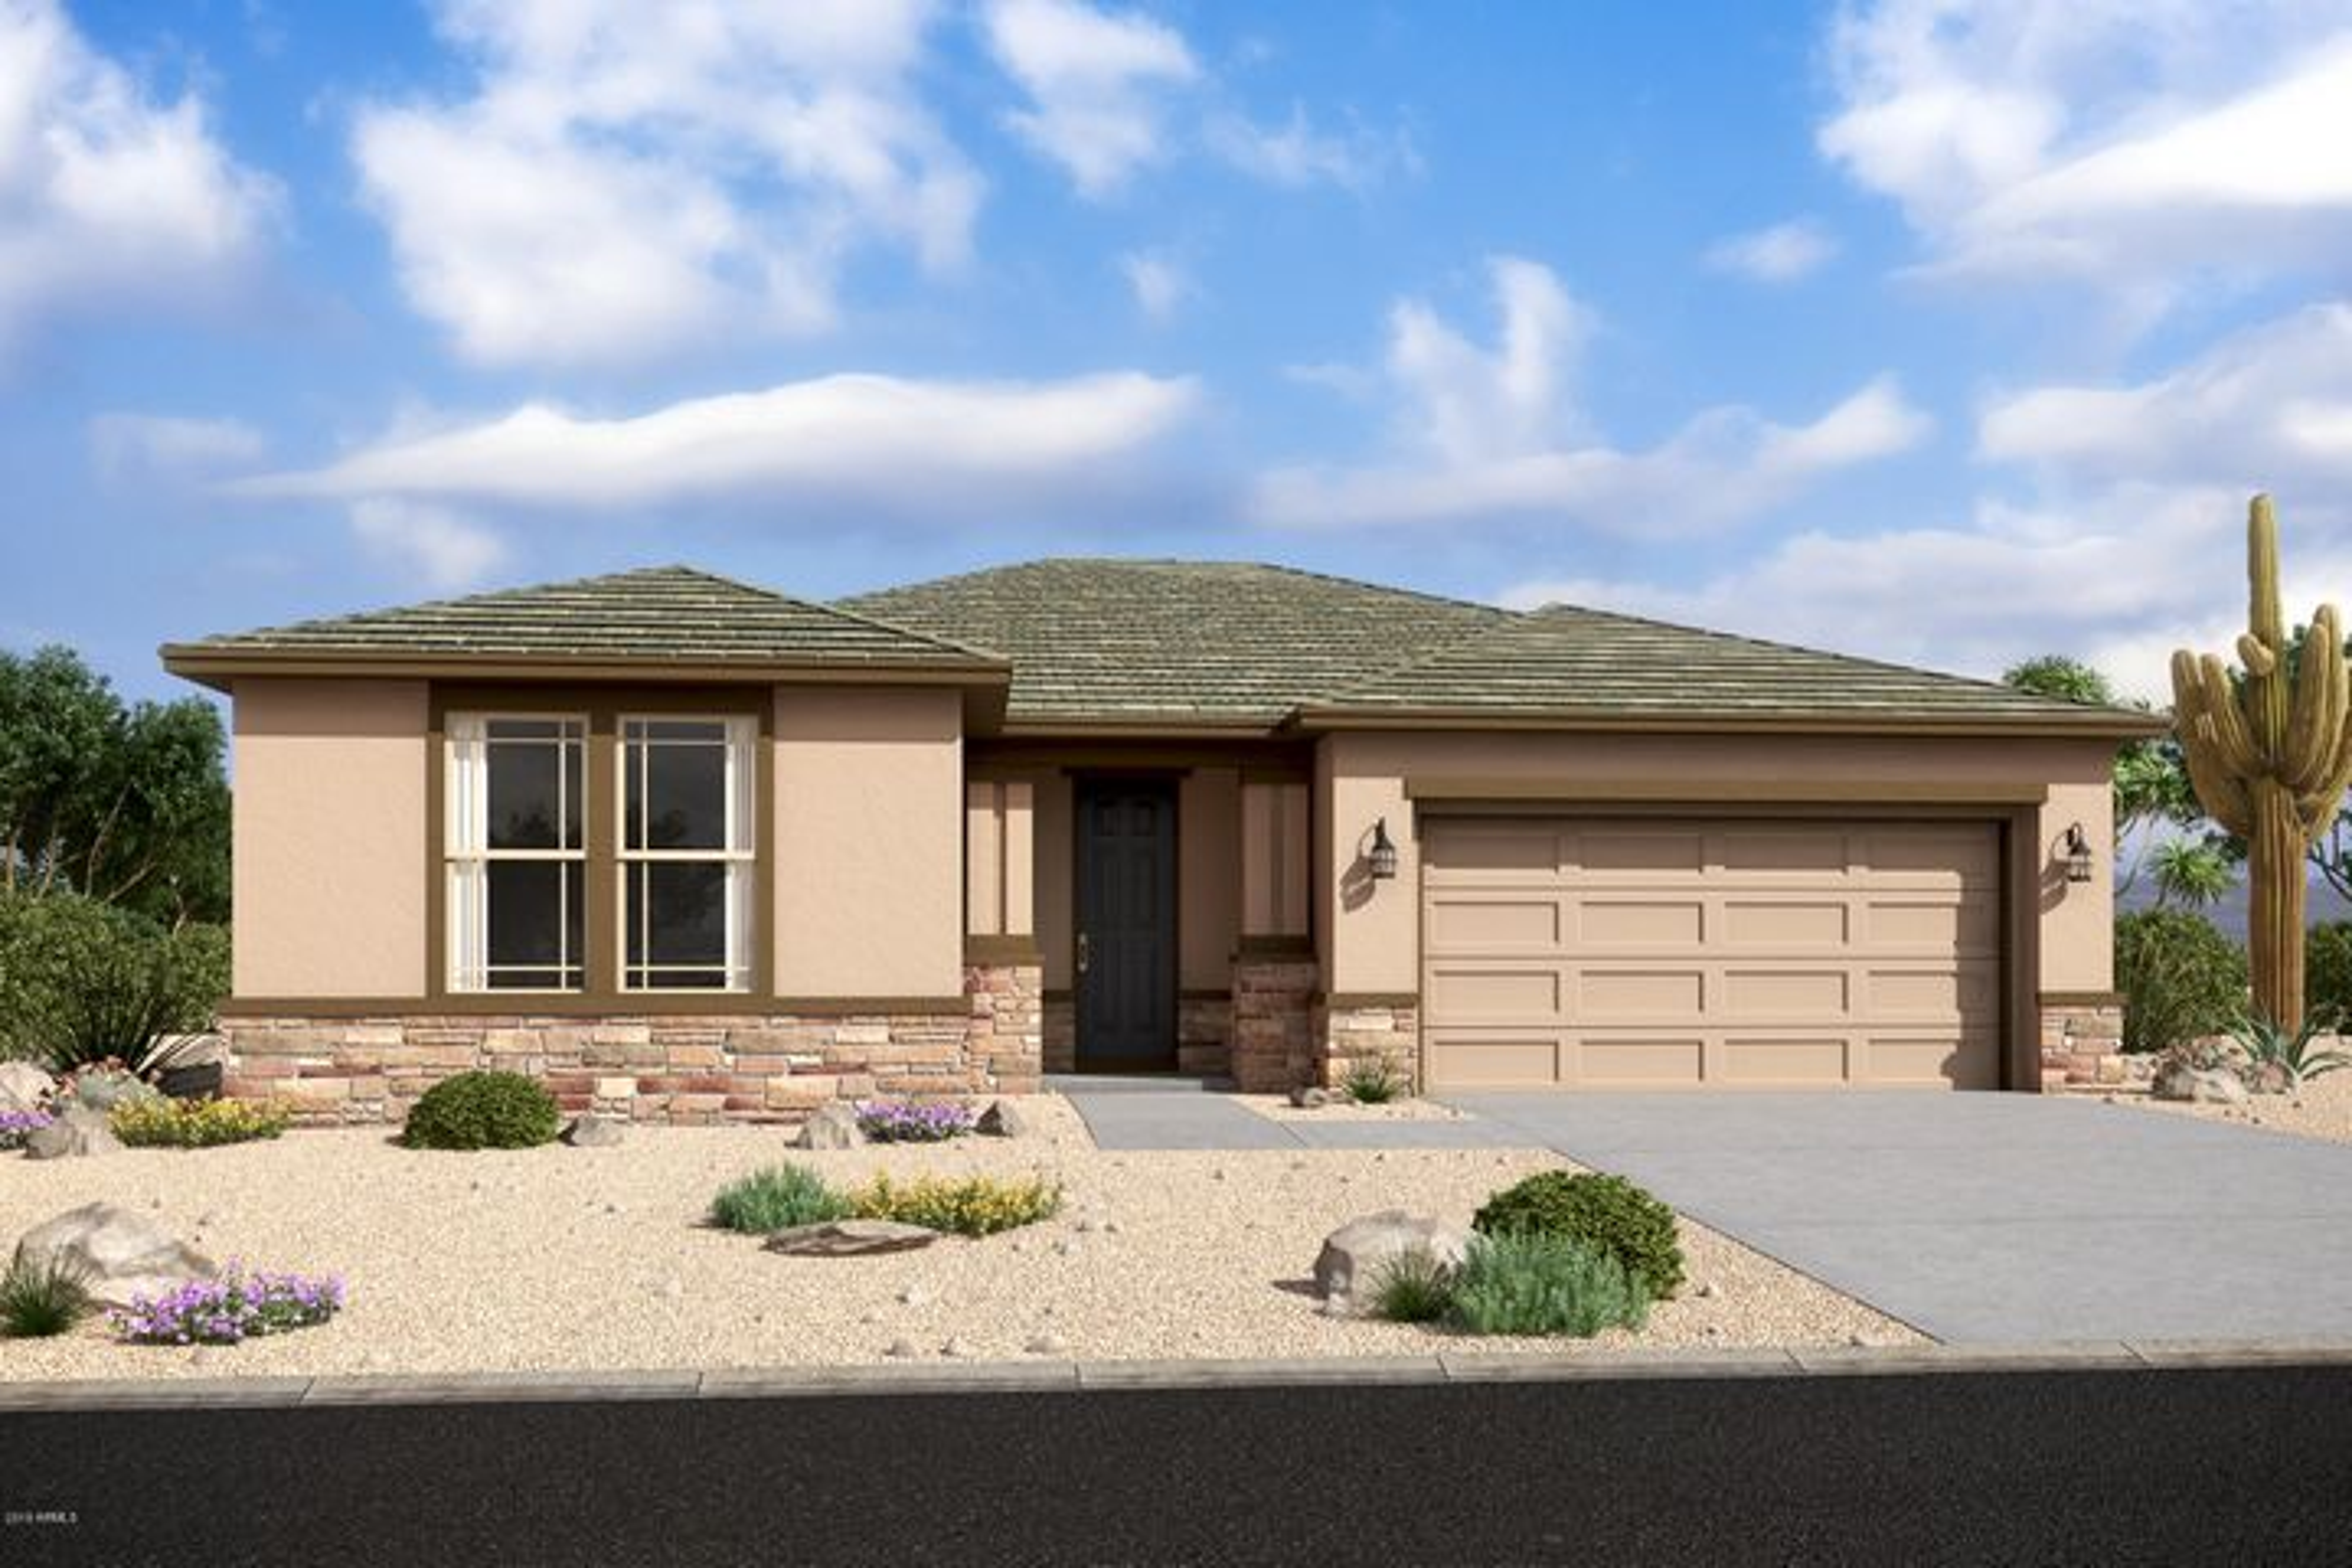 17446 W SUPERIOR Avenue, Goodyear, AZ 85338